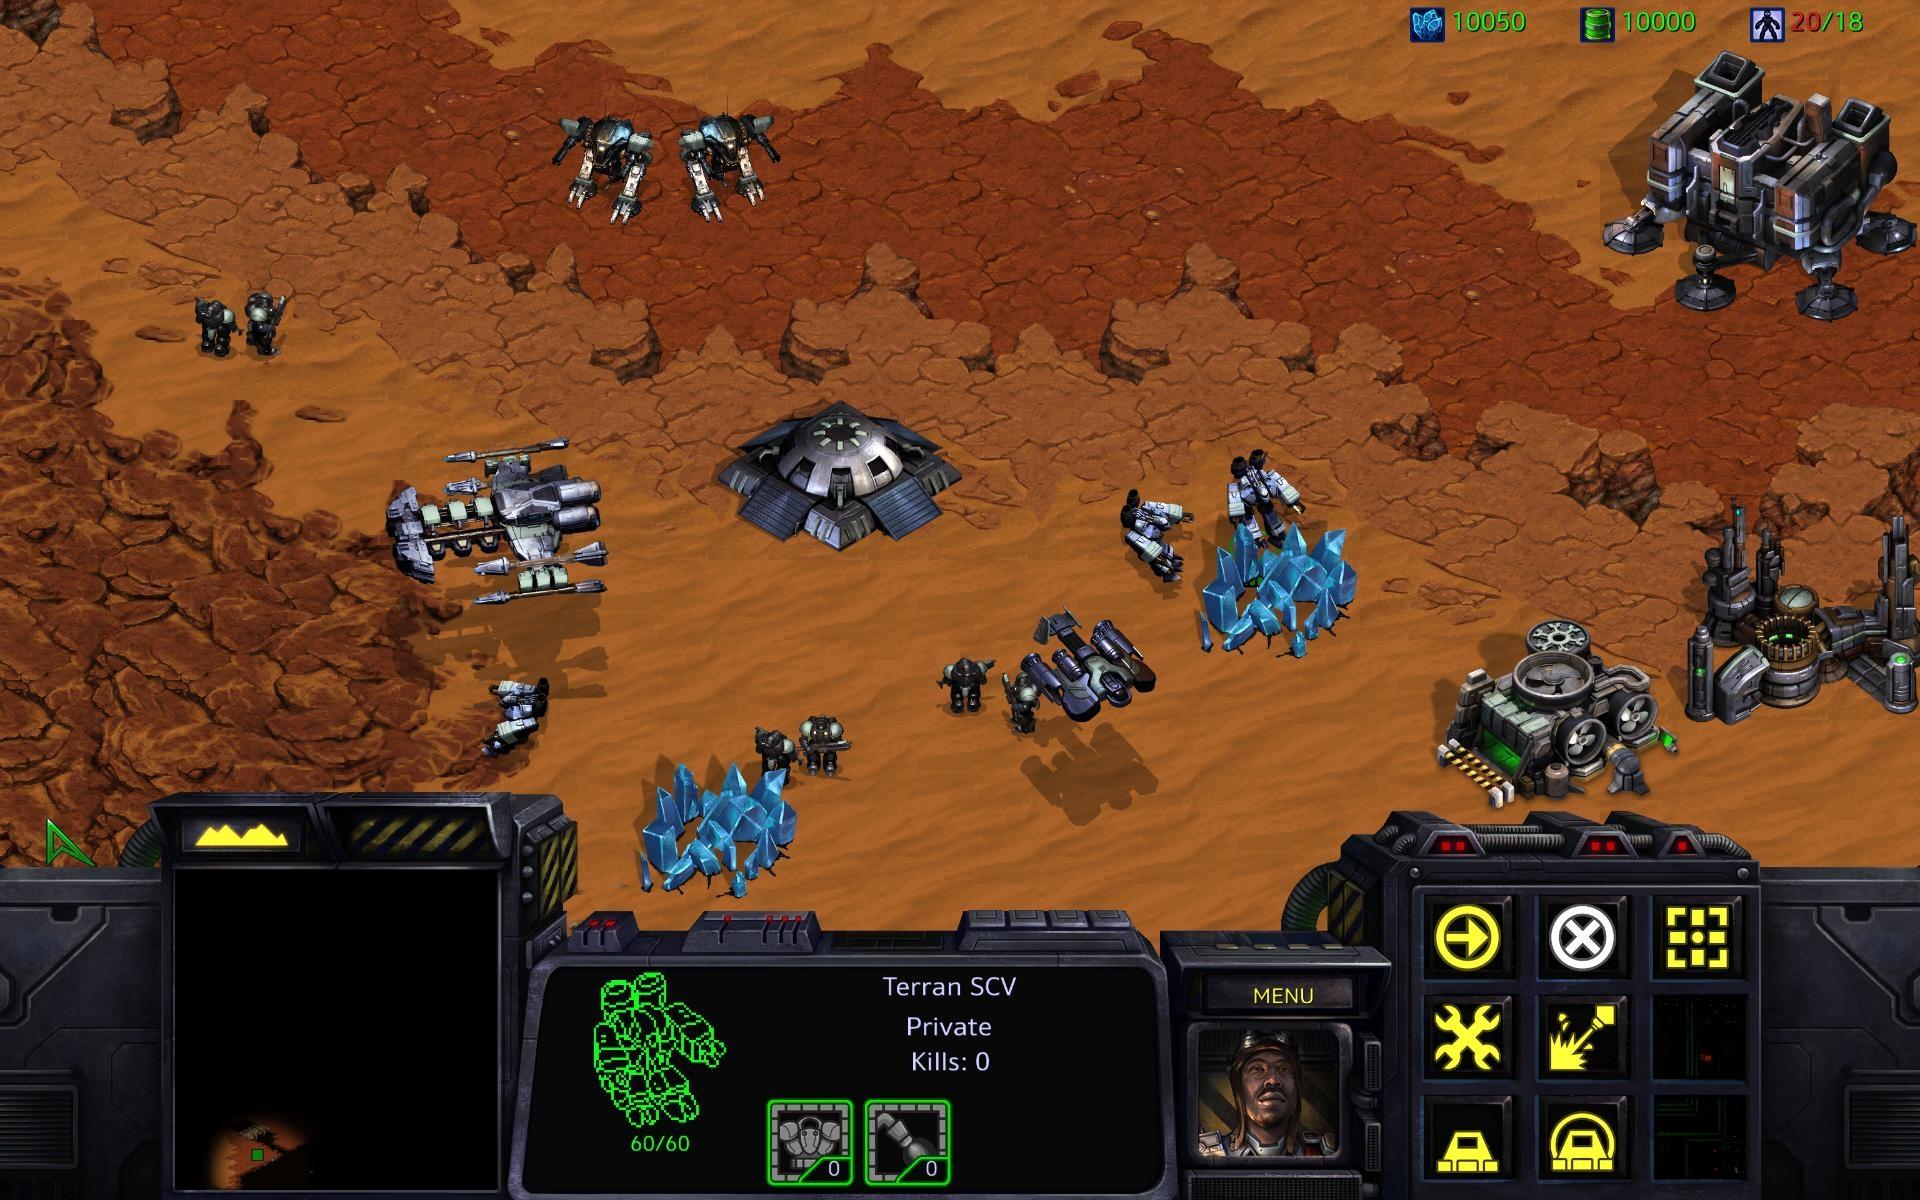 Starcraft Remastered - Terra New